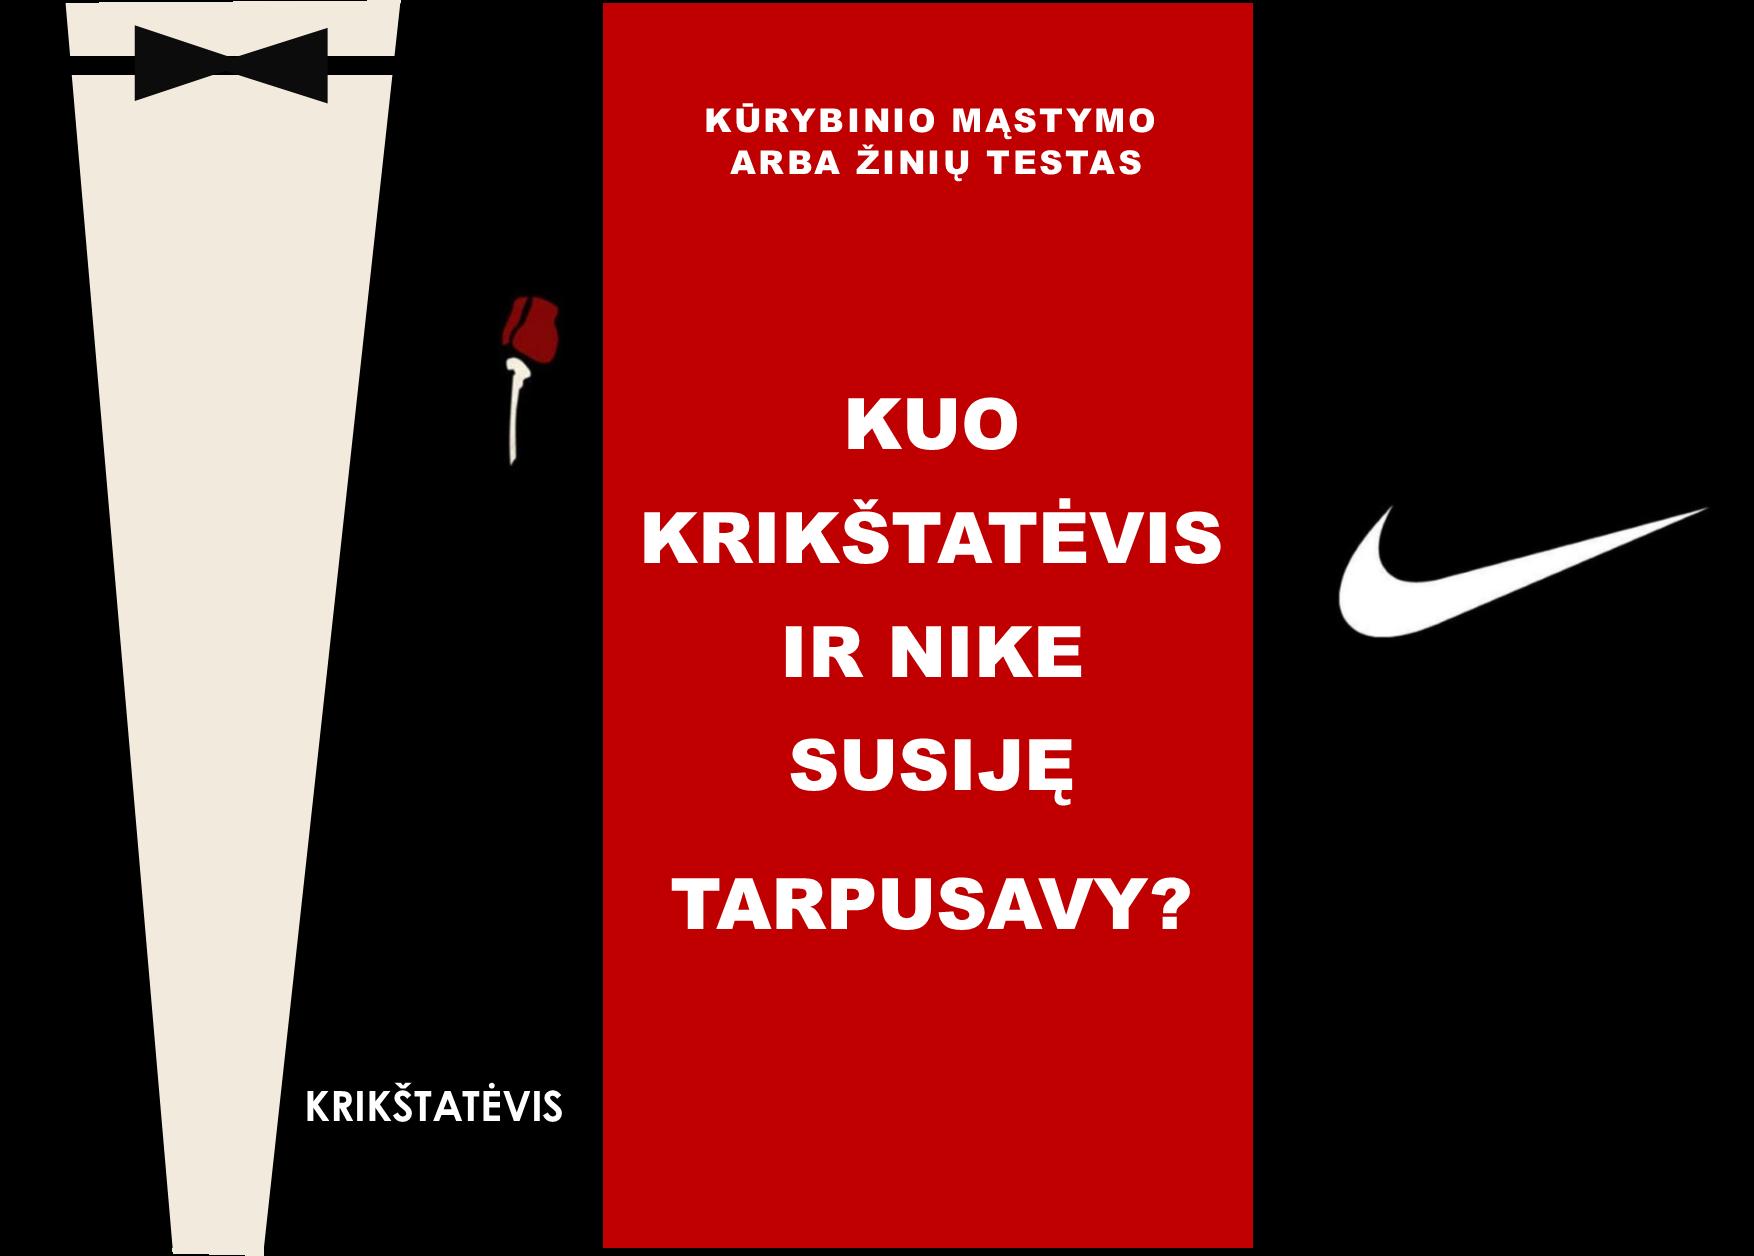 kuo_nike_krikstatevis_susije_tarpusavy.png